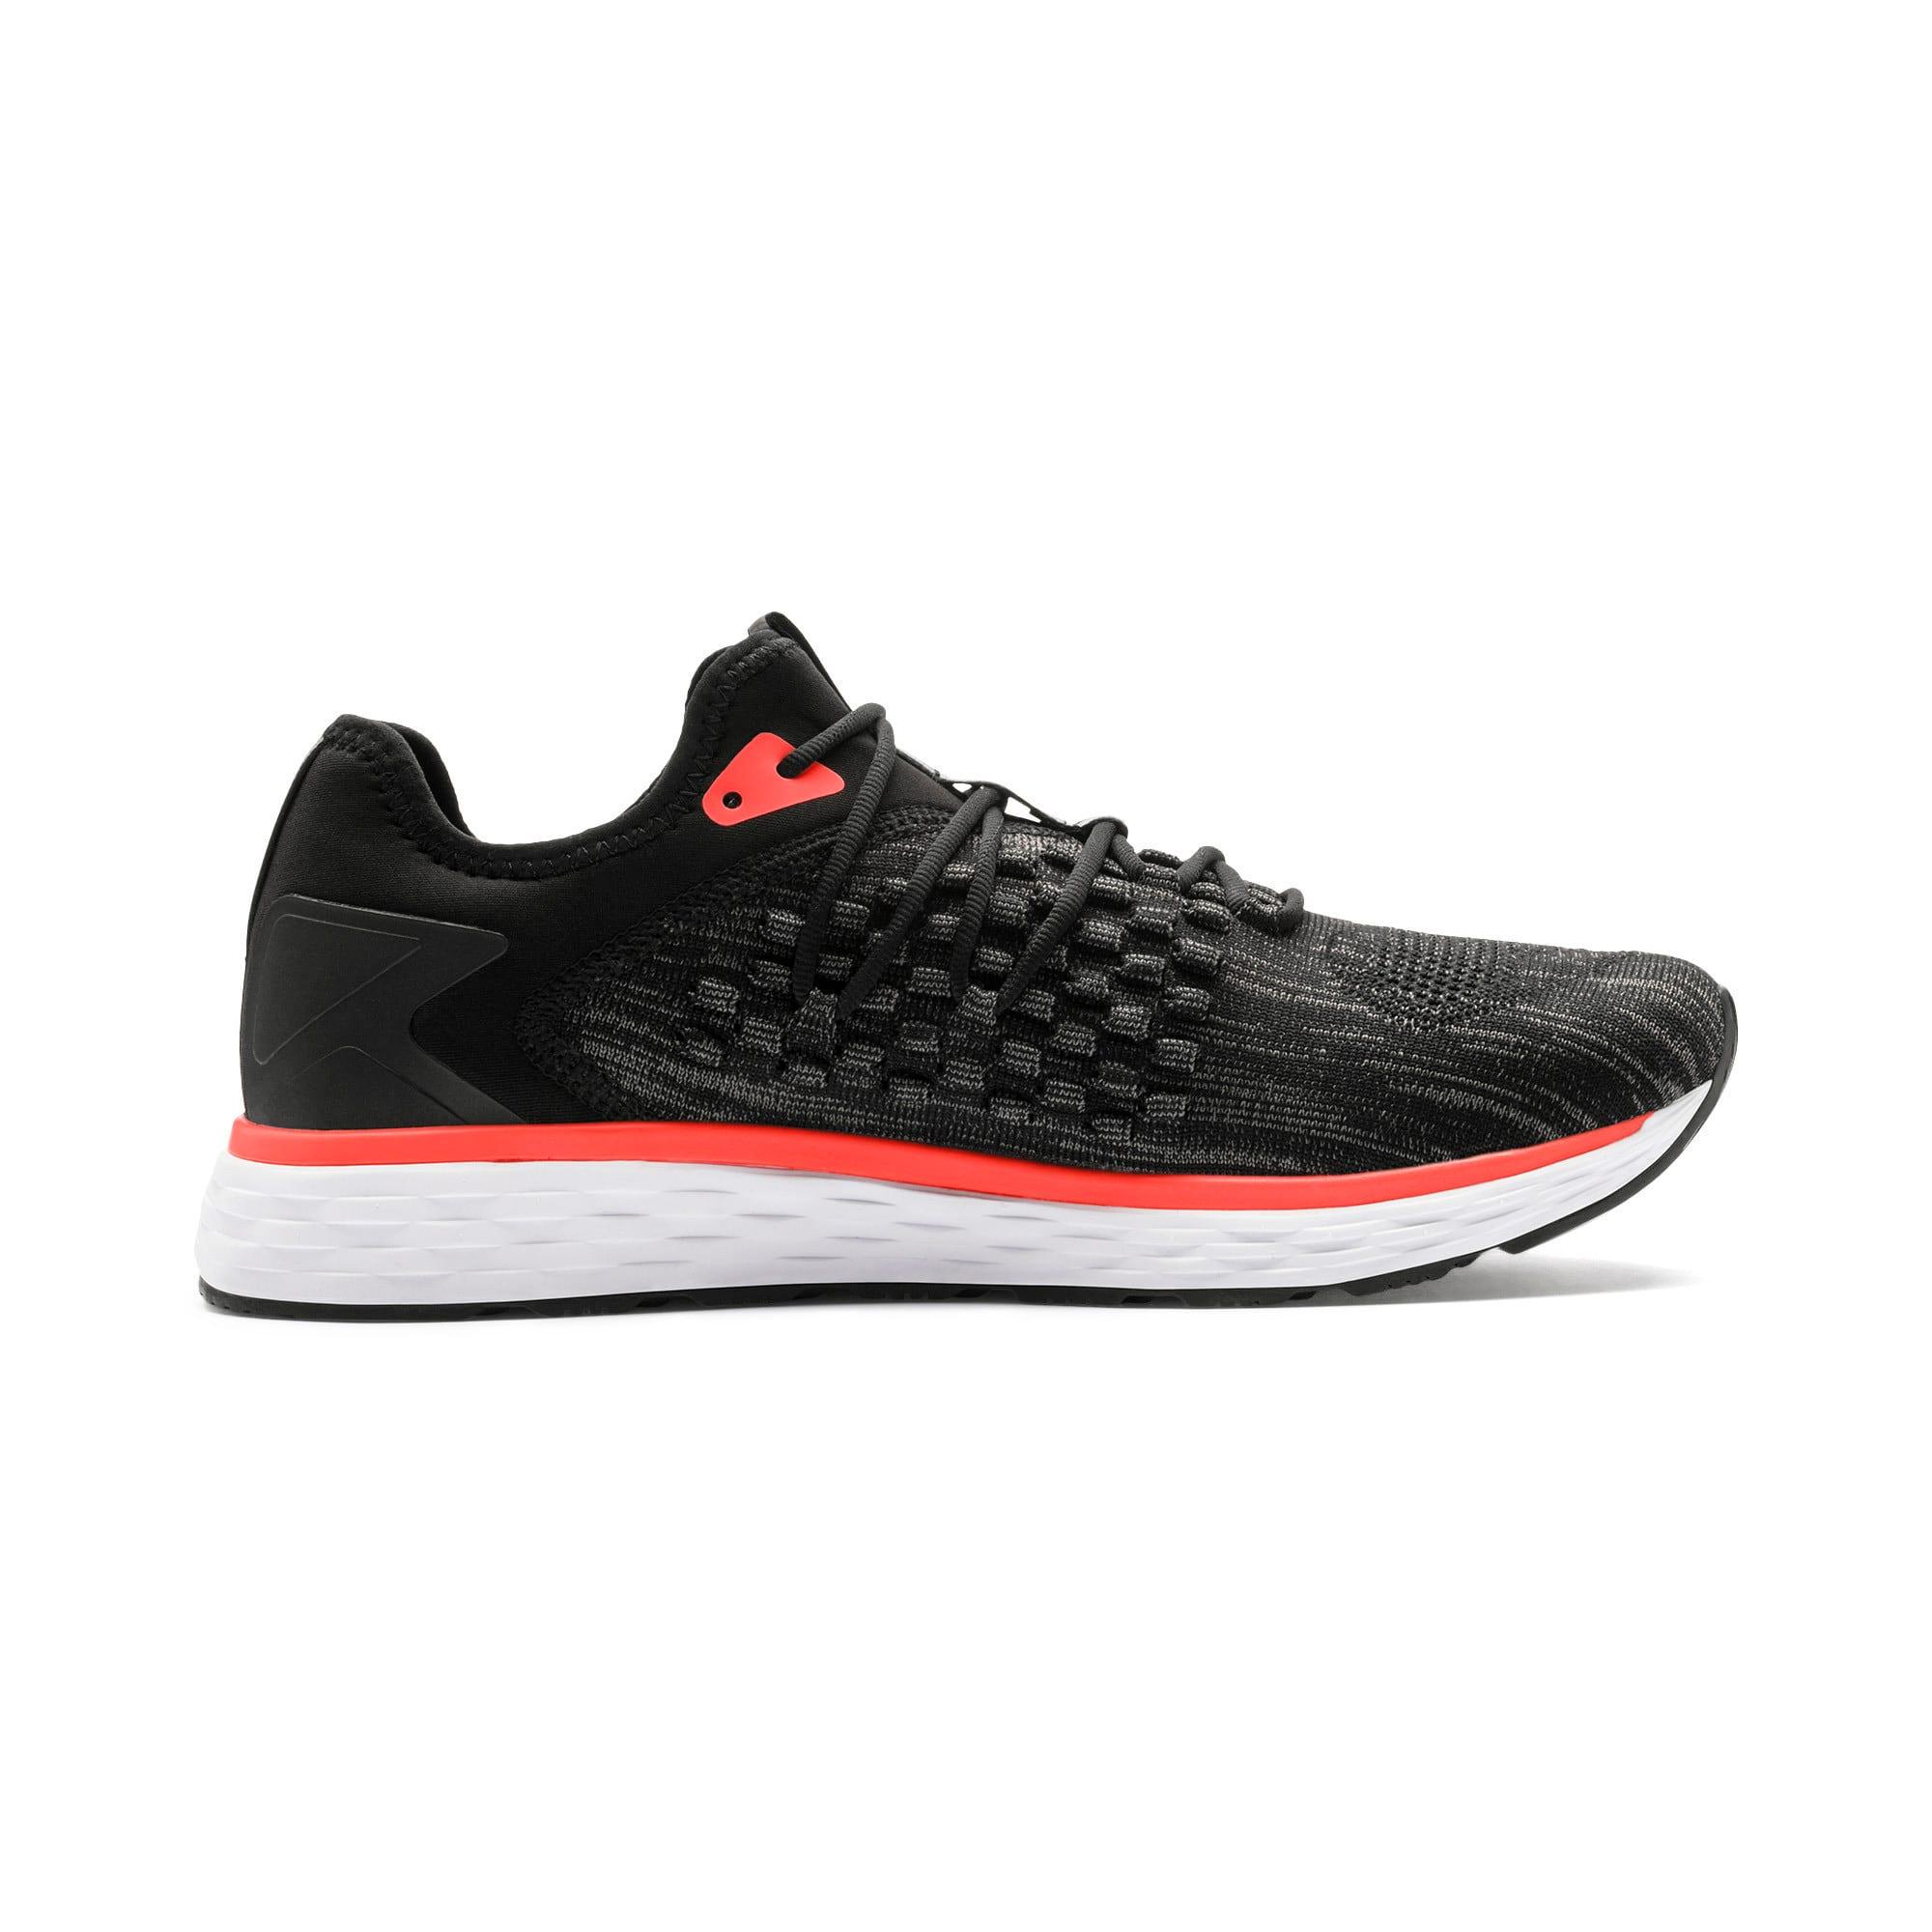 Thumbnail 6 of SPEED FUSEFIT Men's Running Shoes, Puma Black-Nrgy Red, medium